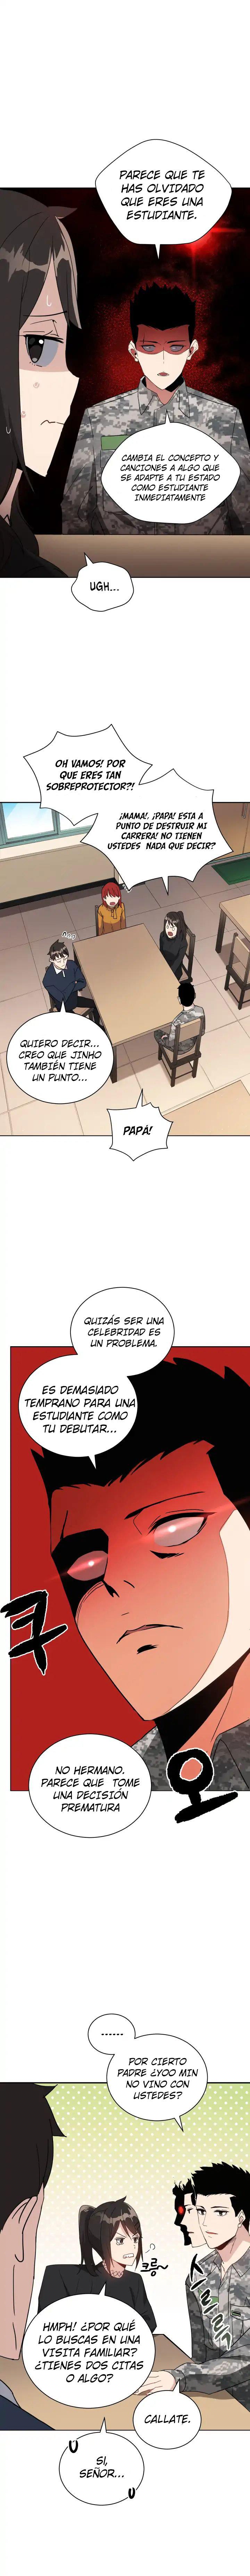 https://nine.mangadogs.com/es_manga/pic8/53/35509/940792/dd3d406d3b700bd0e8c3892bee7334b9.jpg Page 21